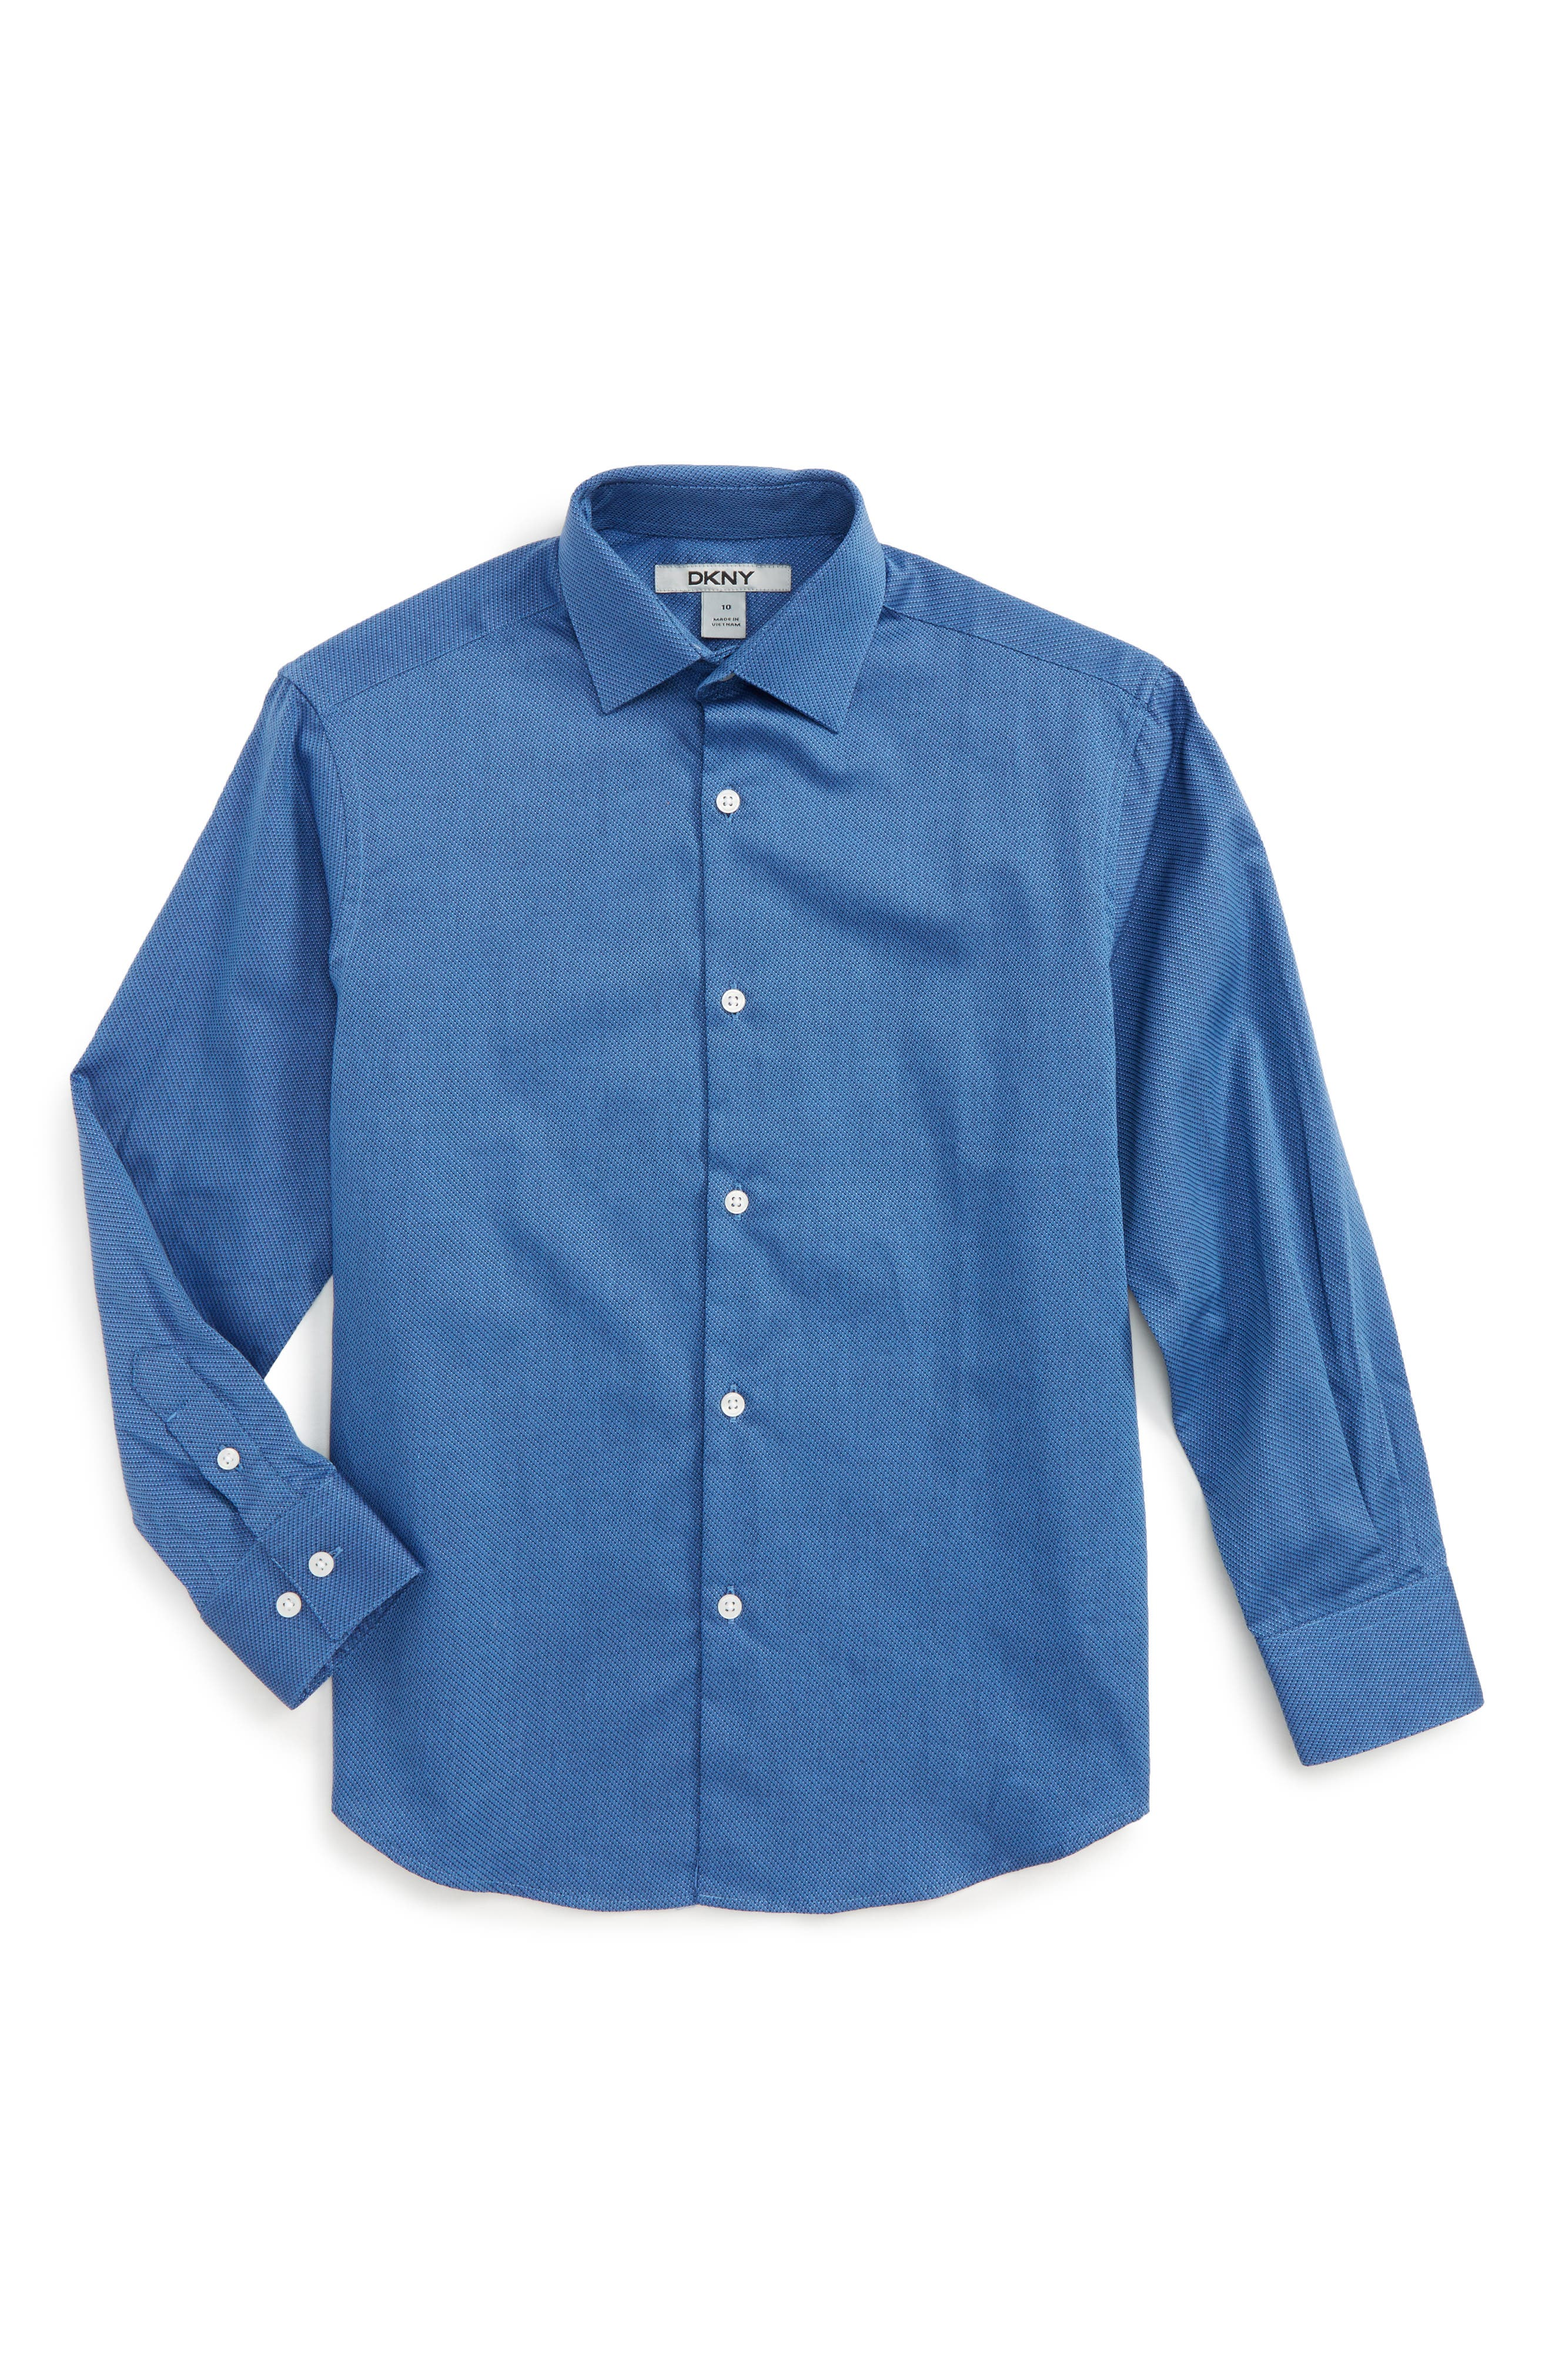 Alternate Image 1 Selected - DKNY Textured Dress Shirt (Big Boys)